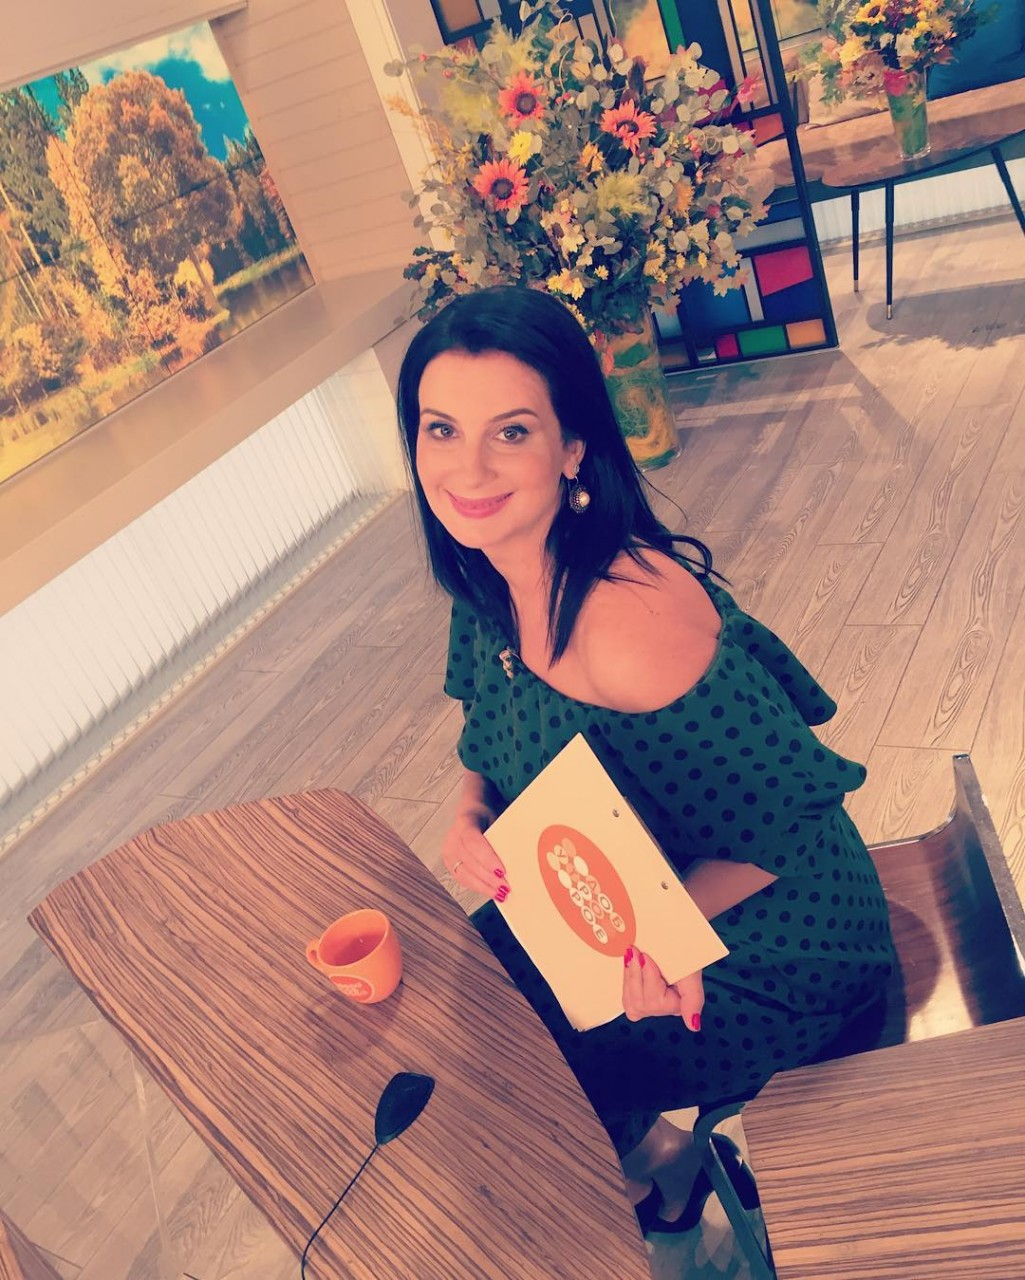 Екатерина Стриженова скоро станет бабушкой